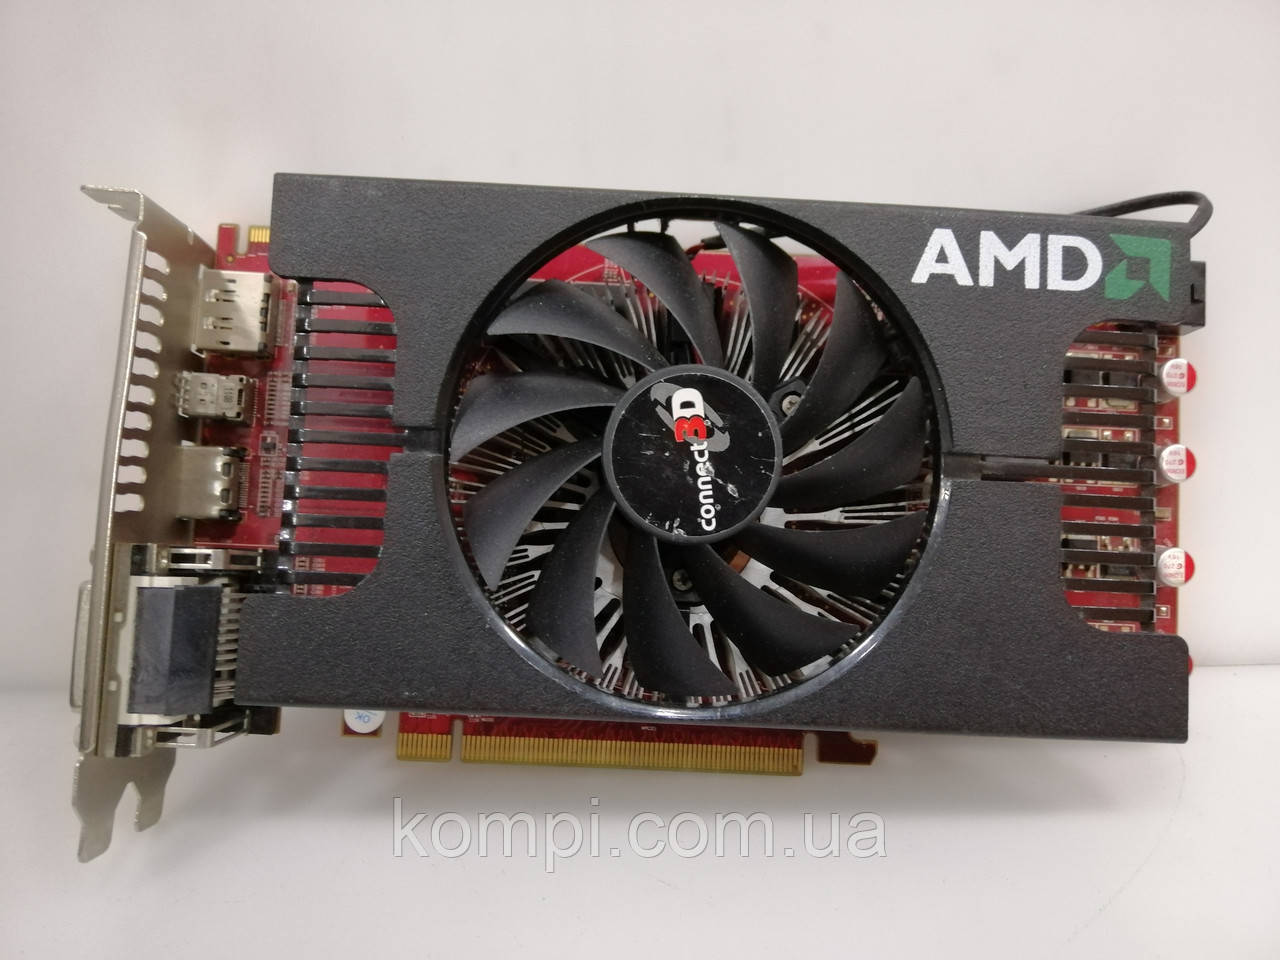 Видеокарта AMD Radeon HD 6850 1GB  PCI-E HDMI